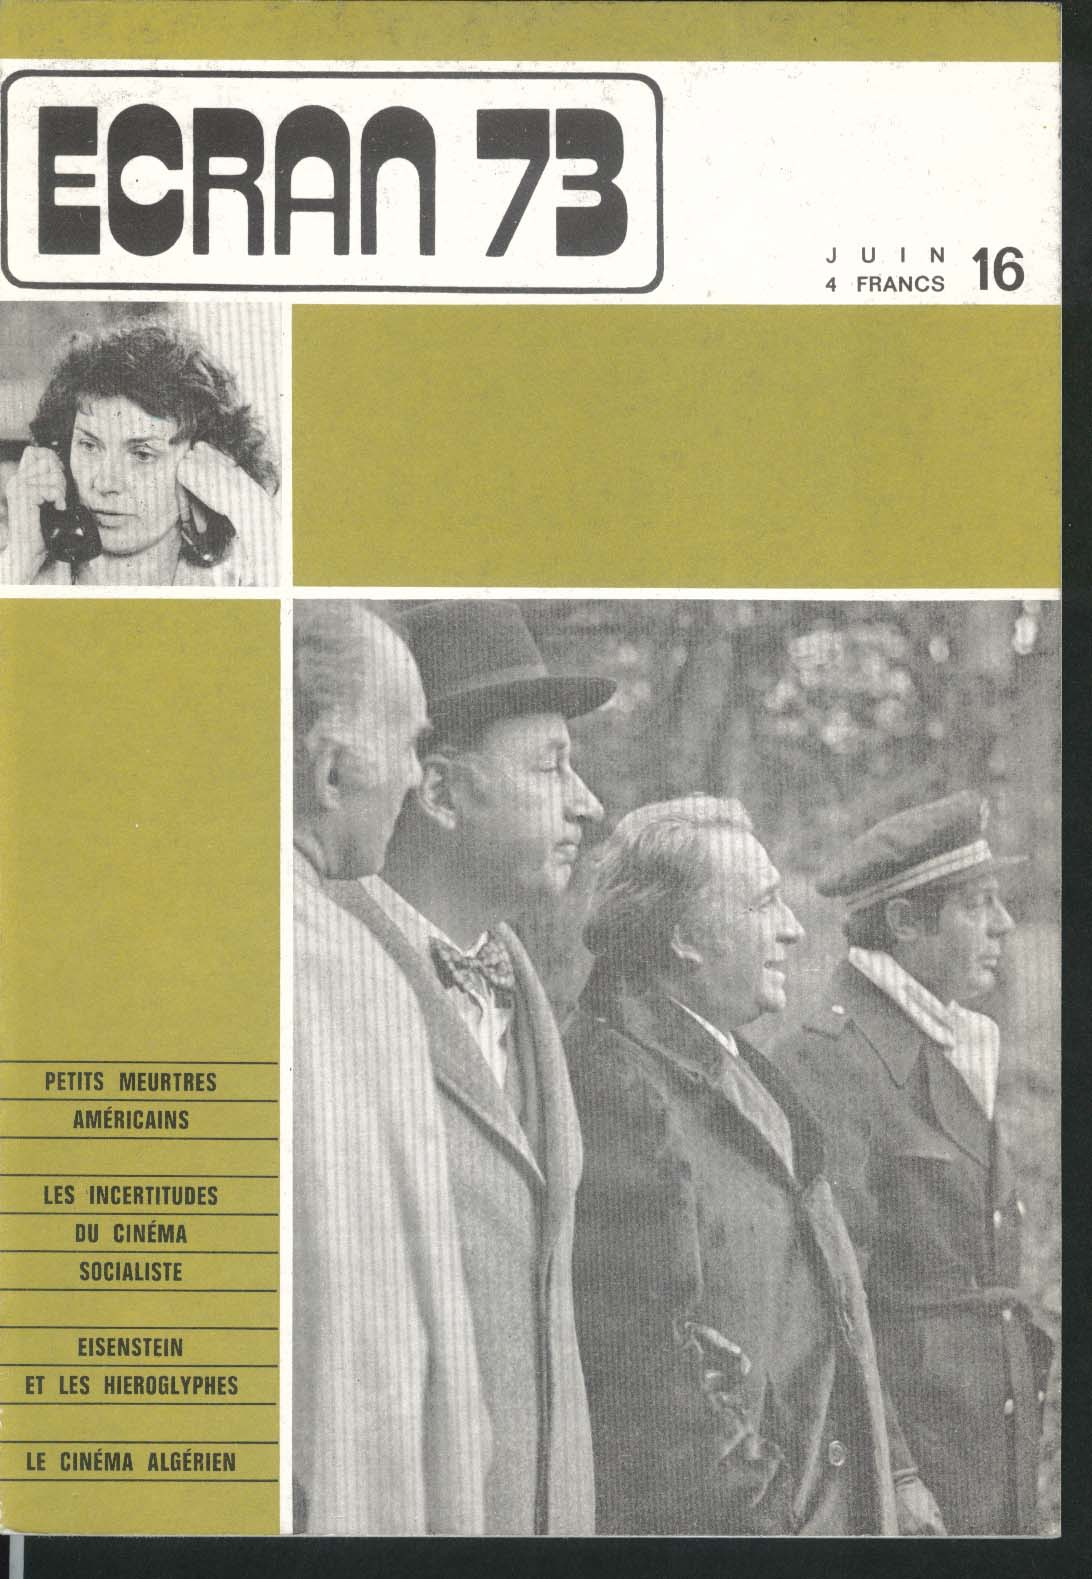 ECRAN #16 Eisenstein Algerian Cinema Socialists Americans 6 1973